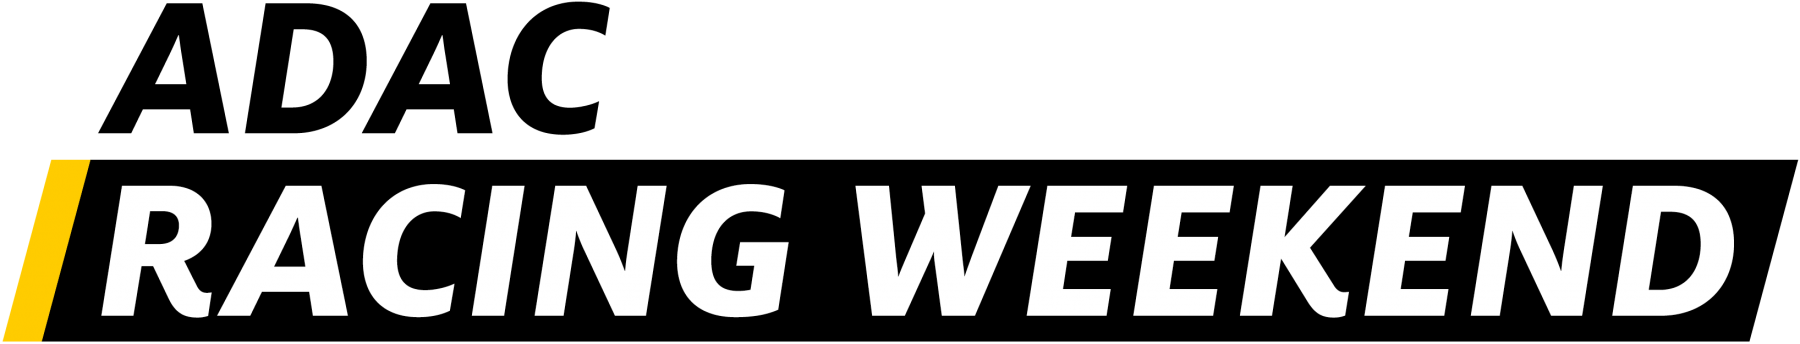 ADAC-Racing-Weekend_2zlg_RGB_positiv